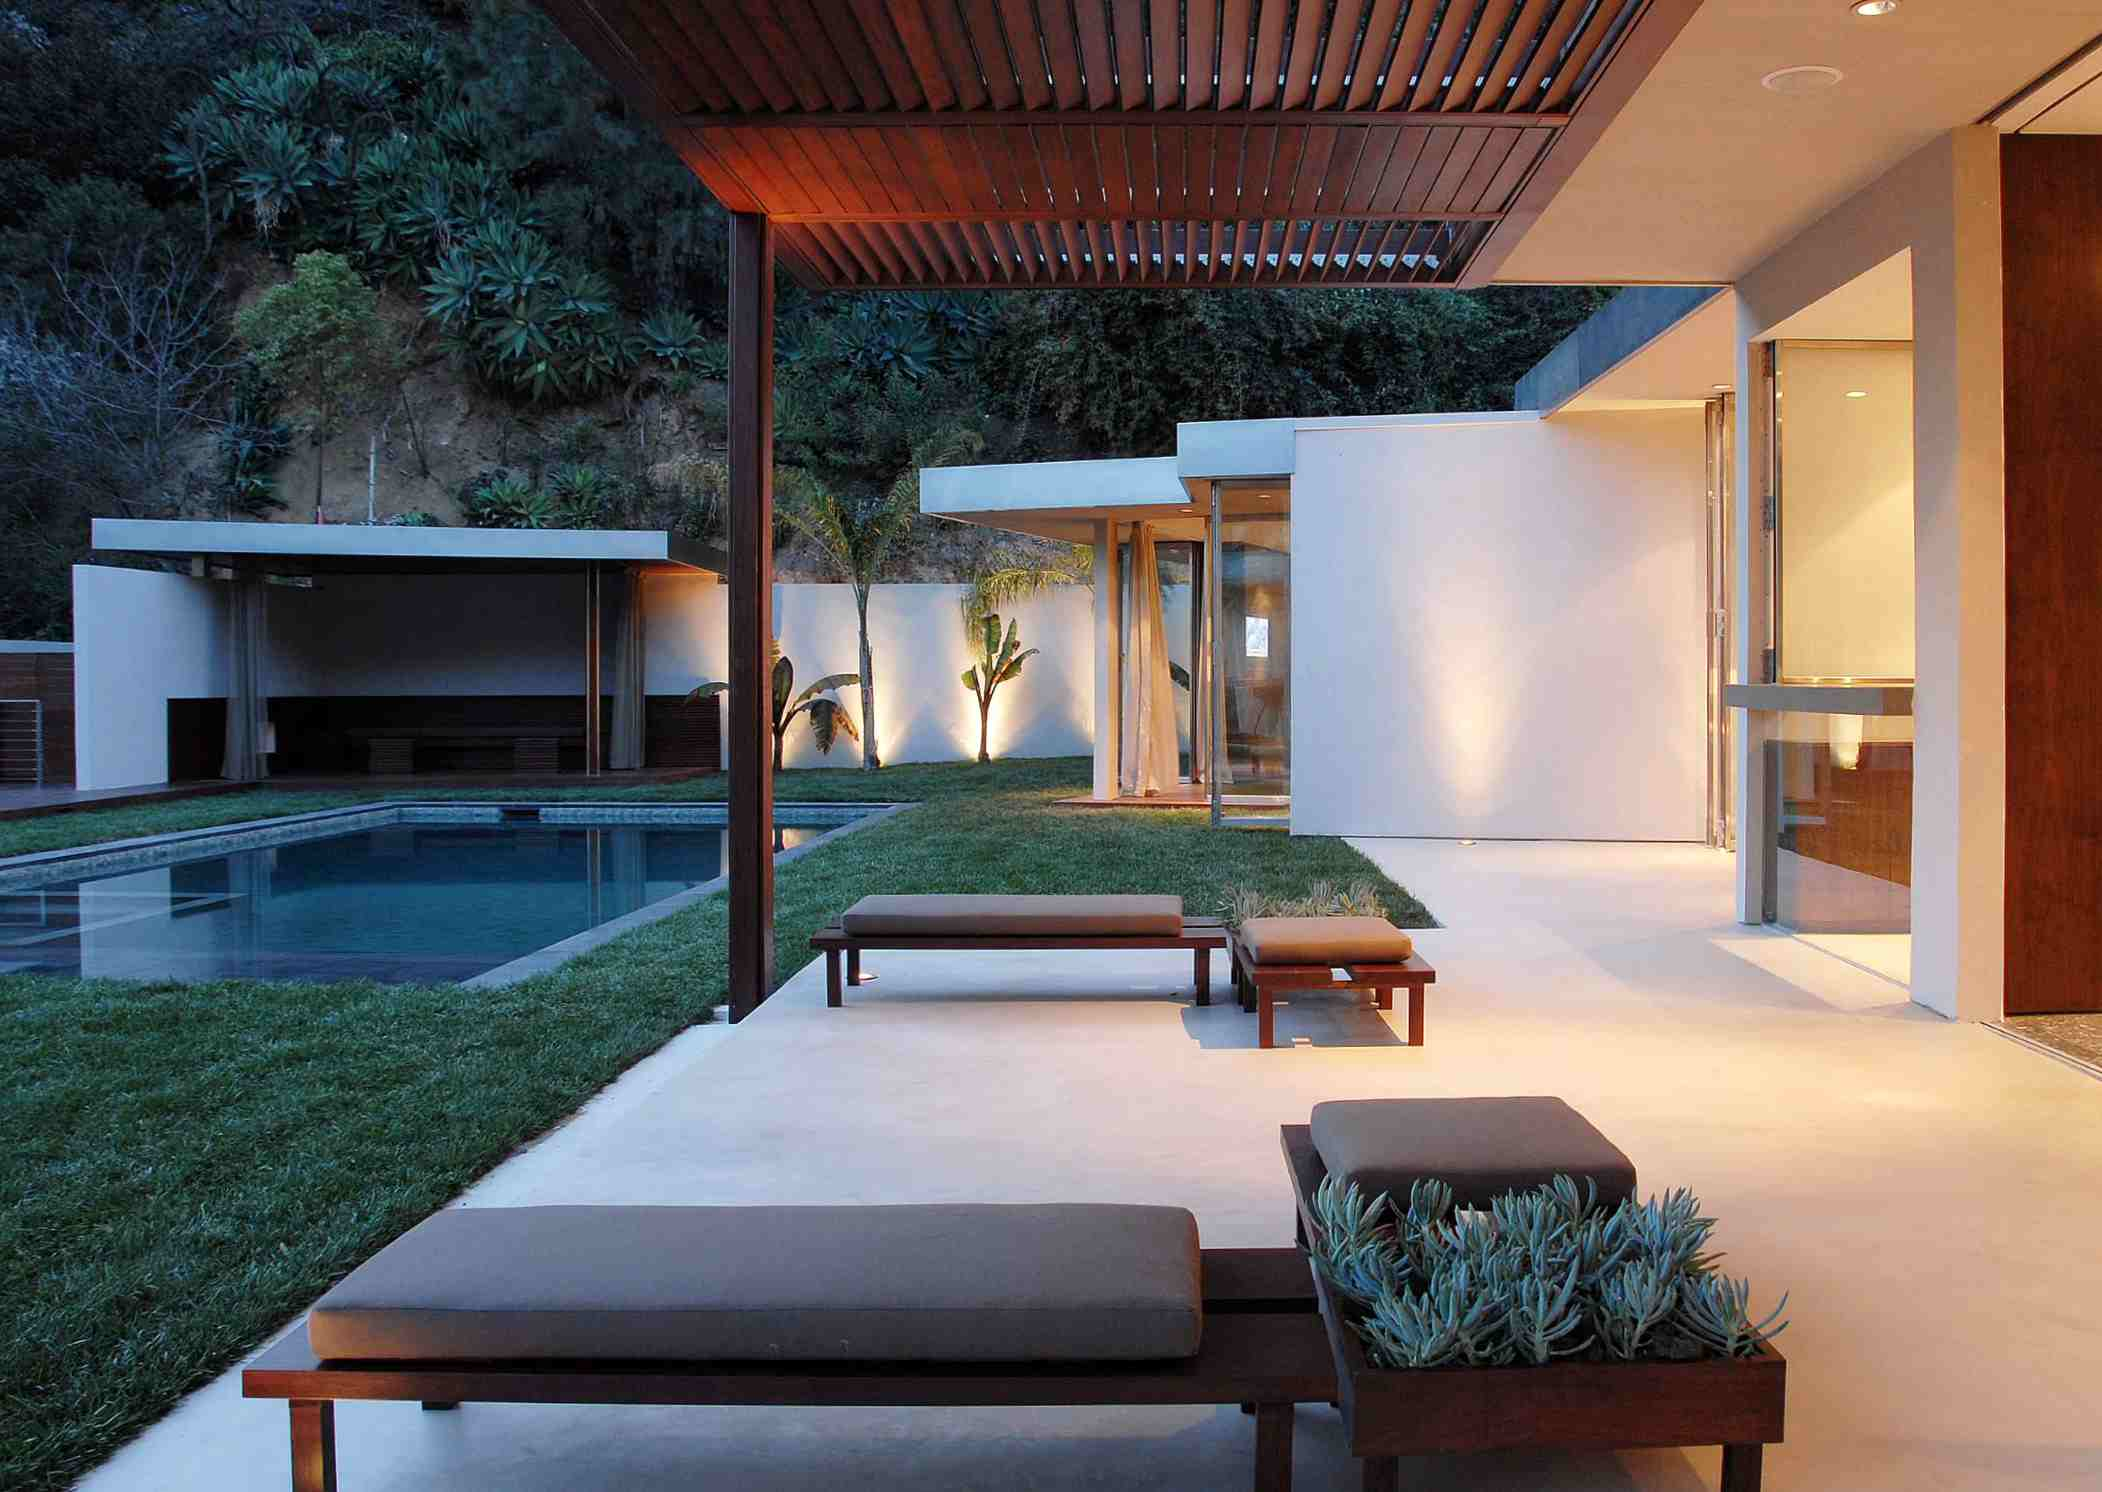 covered patio ideas near pool minimalist house